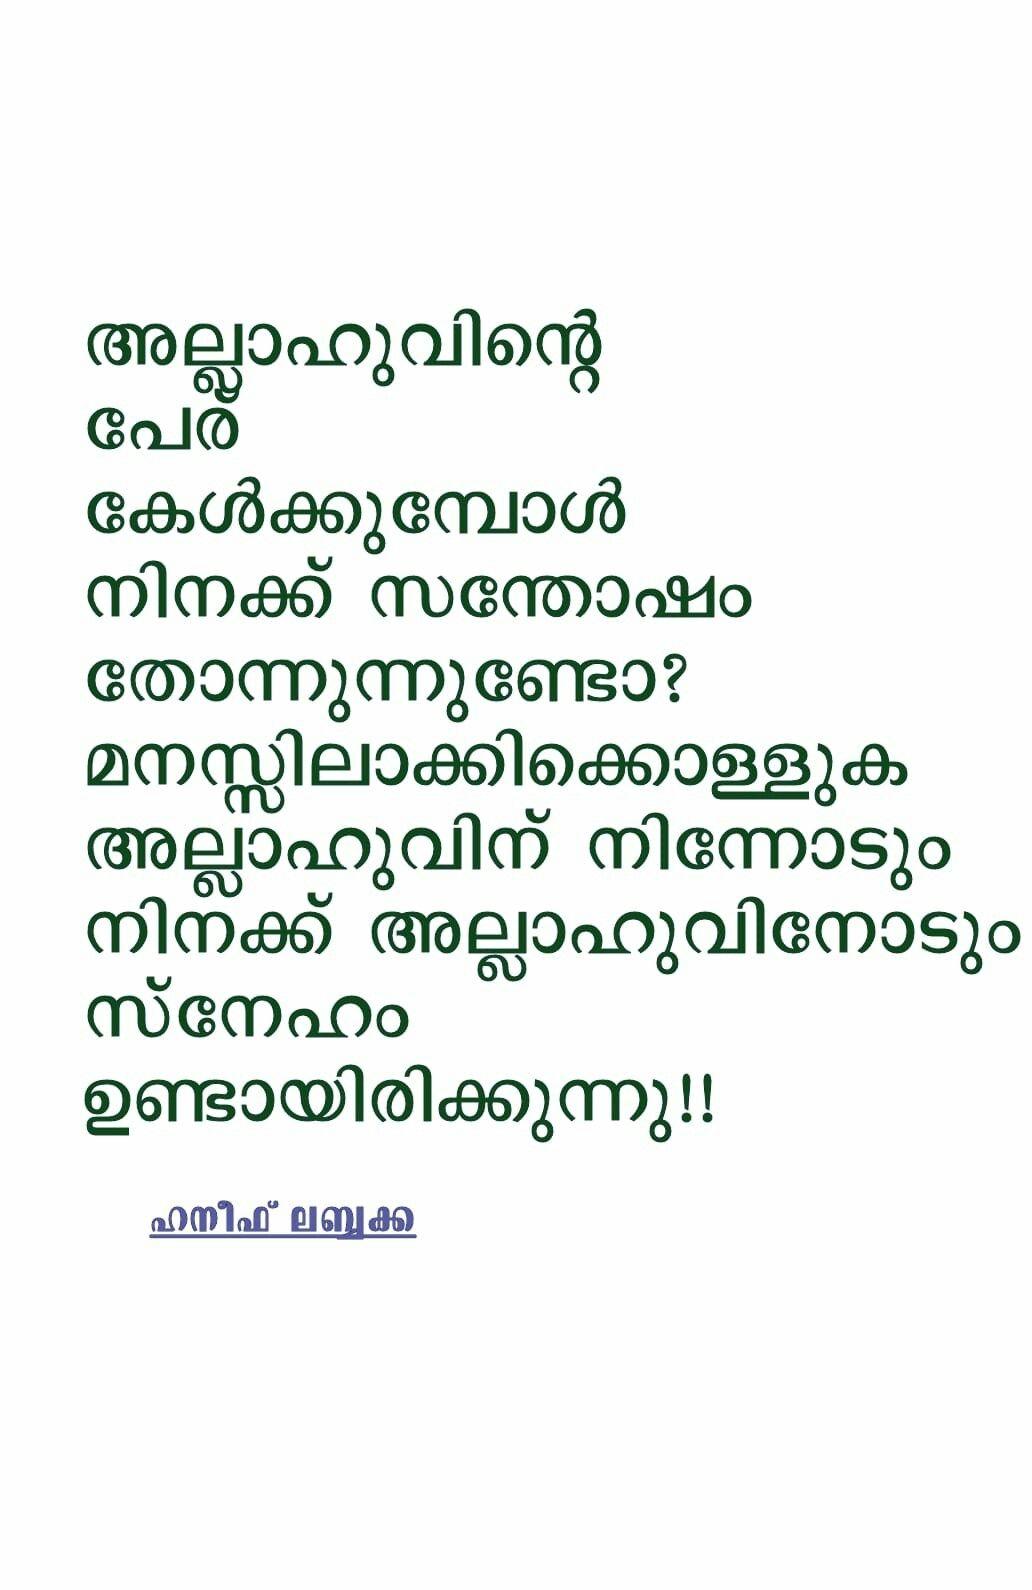 Pin by Aseeb Asb on സർഗാത്മക ചിന്തകൾ Malayalam quotes